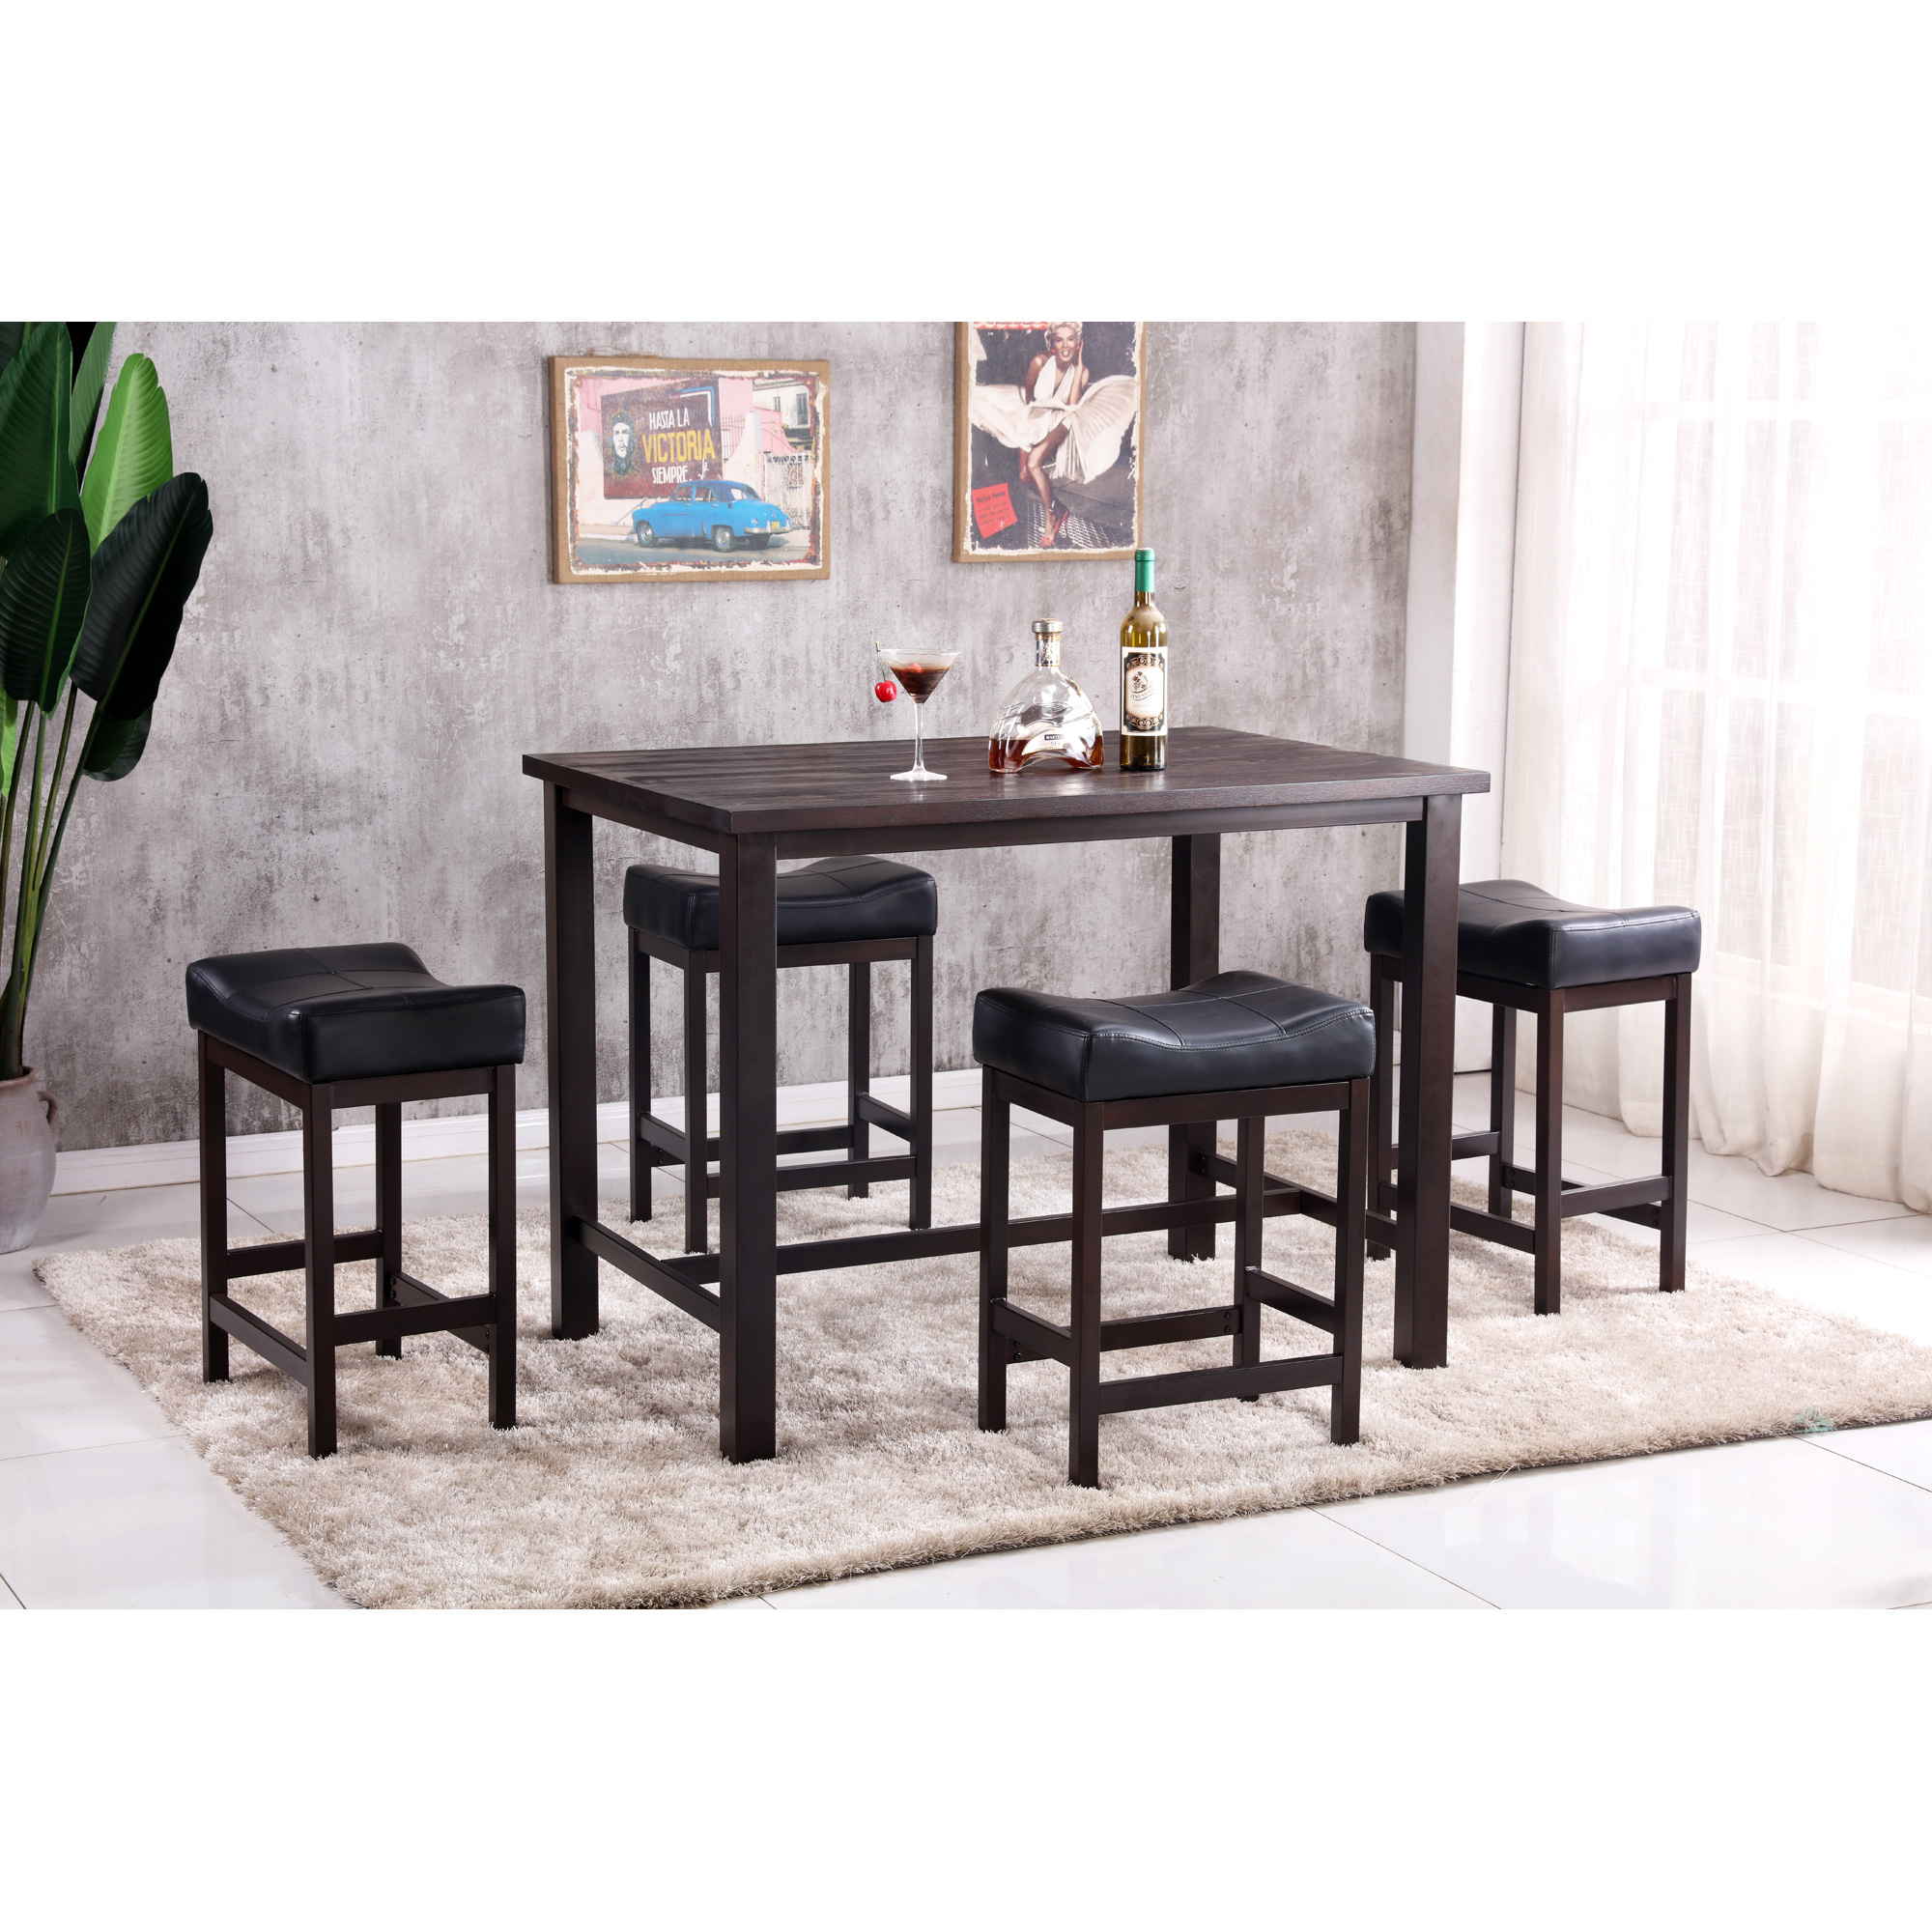 Lifestyle Furniture | Stanley Rustic Walnut 5 Piece Dining Set